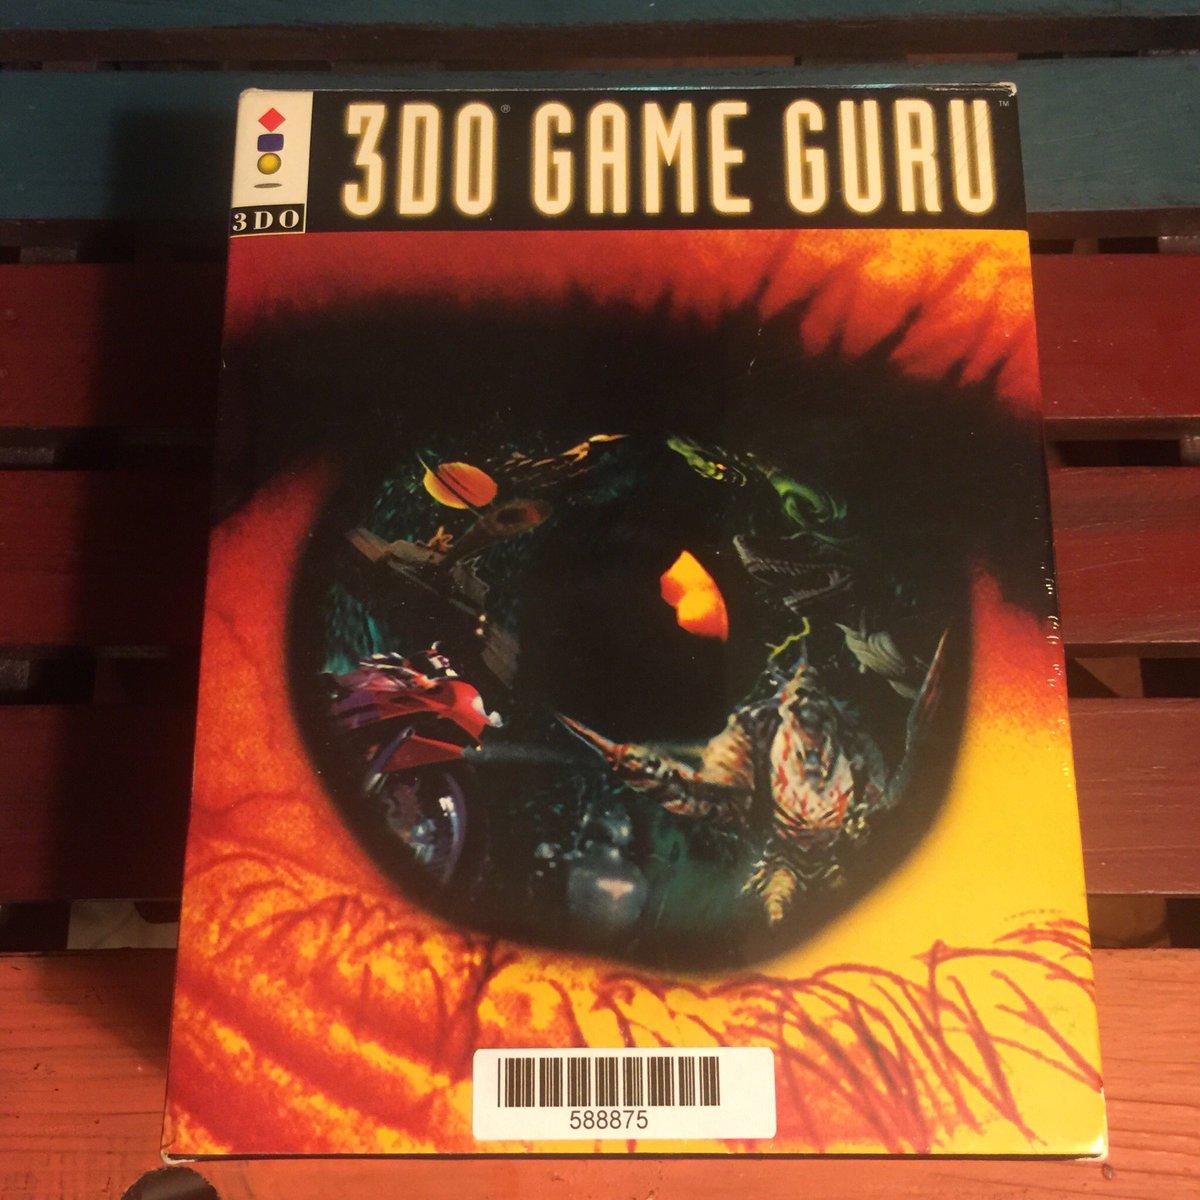 3DO Game Guru Highlights Super WC's Debug Menu (June 29